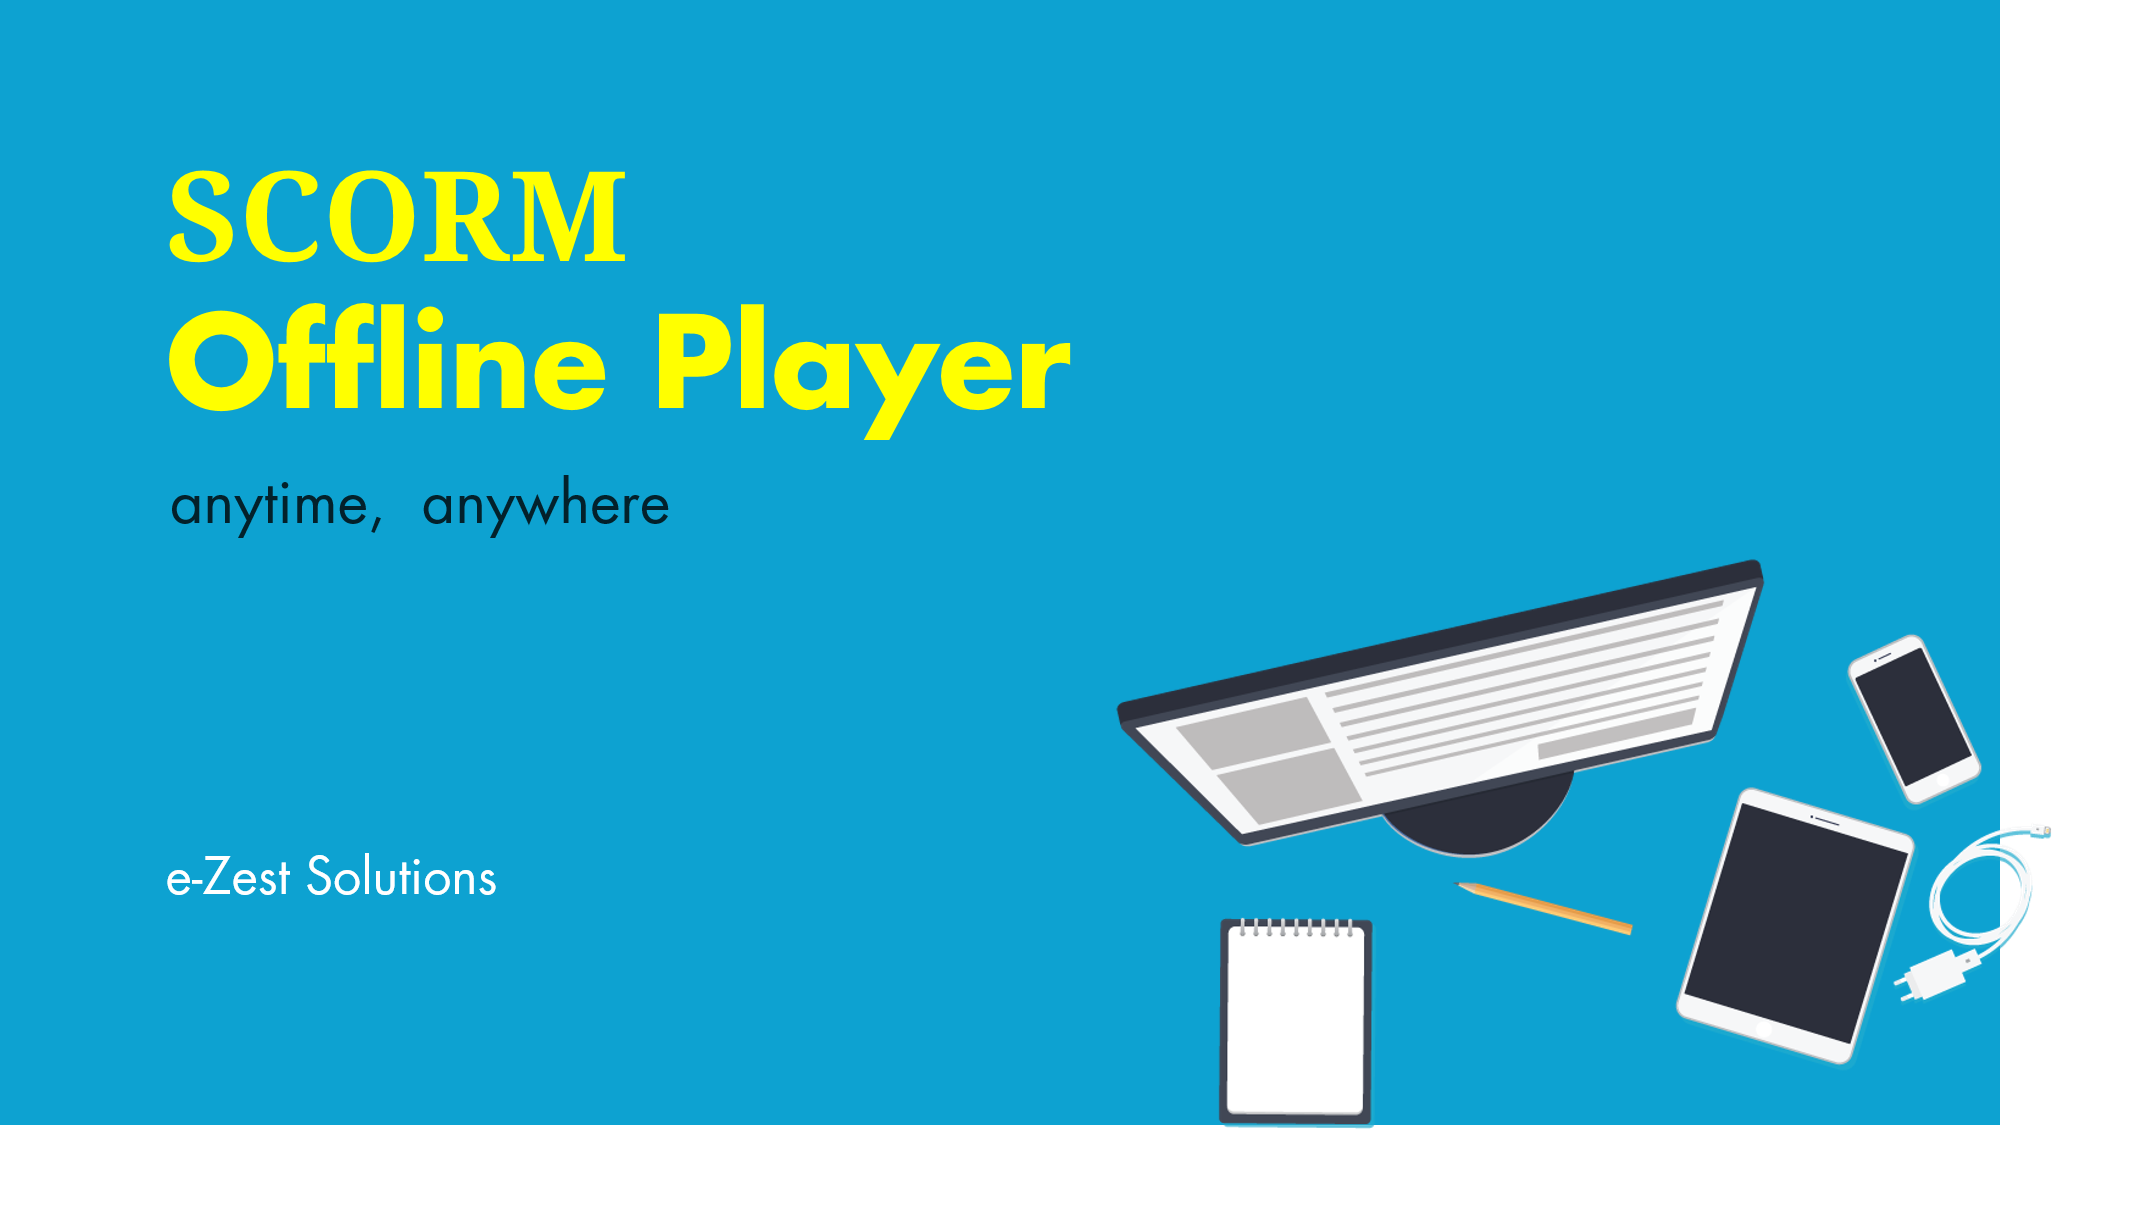 SCORM Offline Player picture